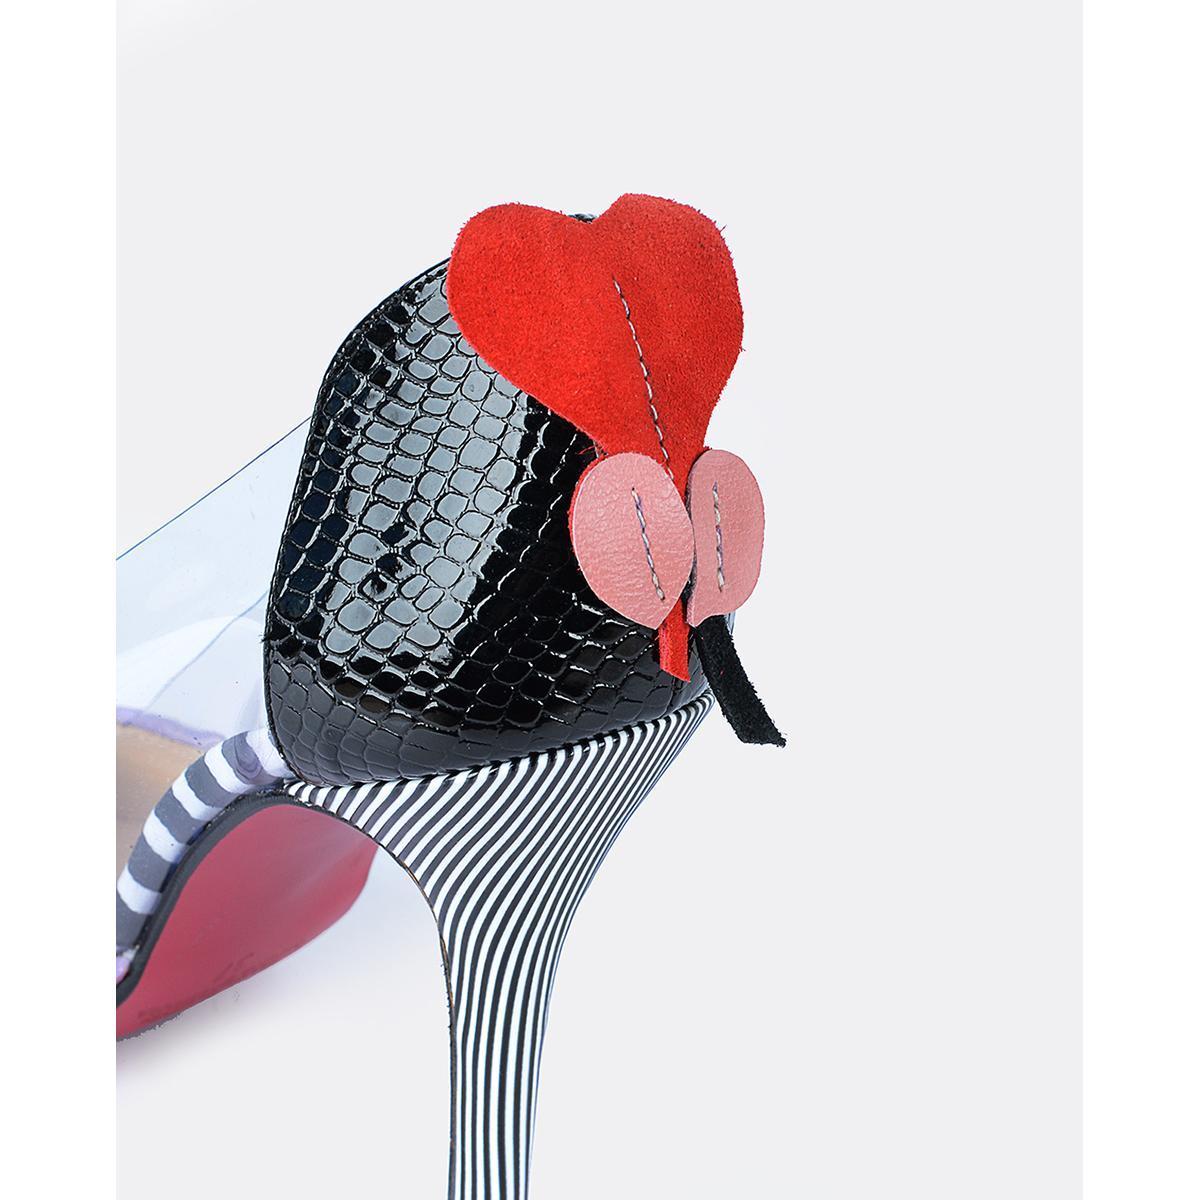 De Mujer Piel Tacon Multicolor Cuple Zapatos wqT6tAqpx